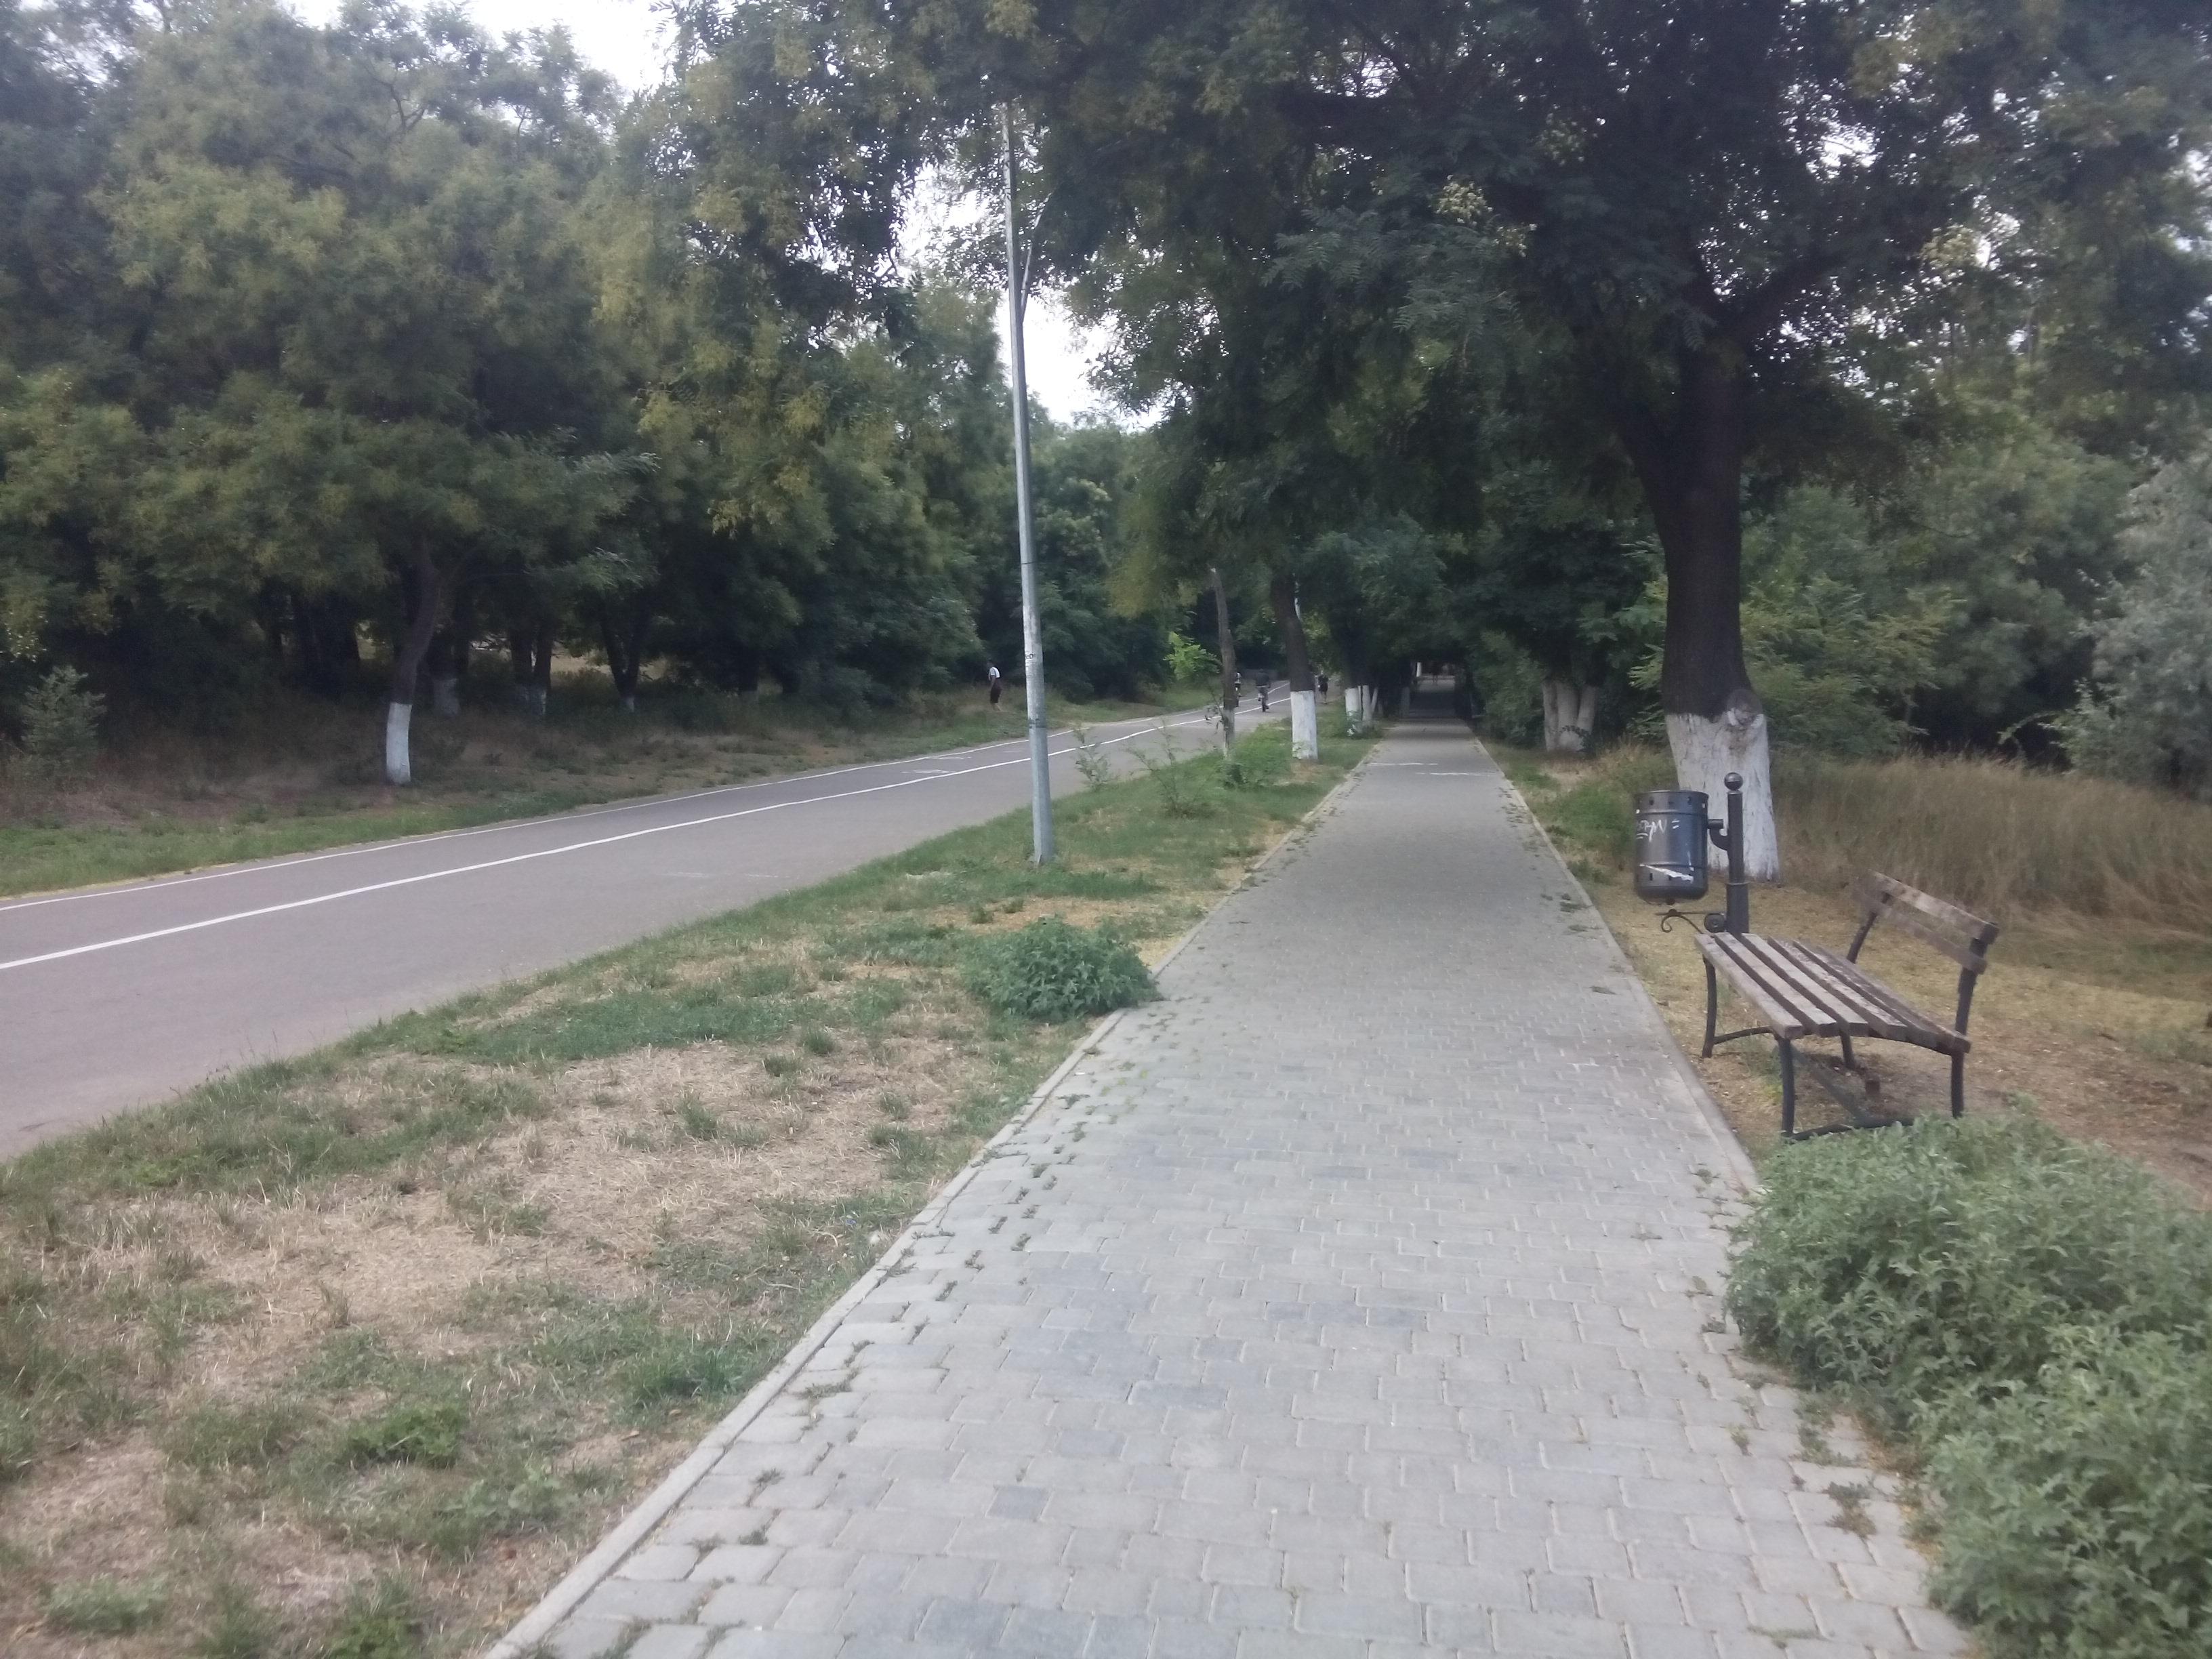 https://i.amy.gy/201808-ukraine/IMG_20180731_184019.jpg